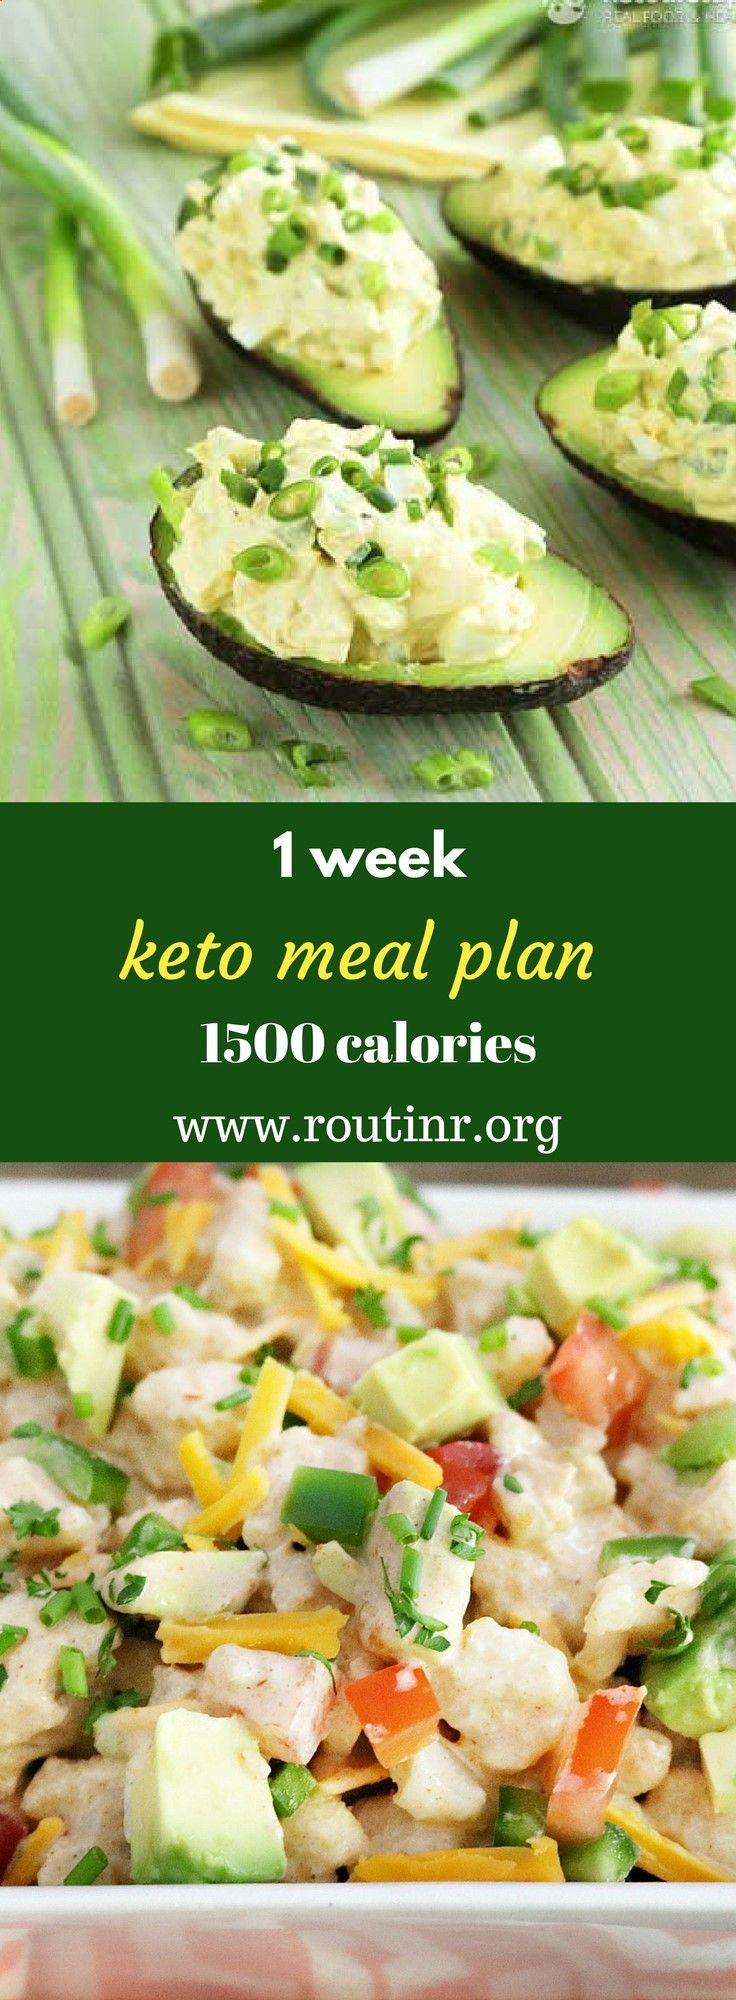 Sample 1200 Calorie Keto Meal Plan